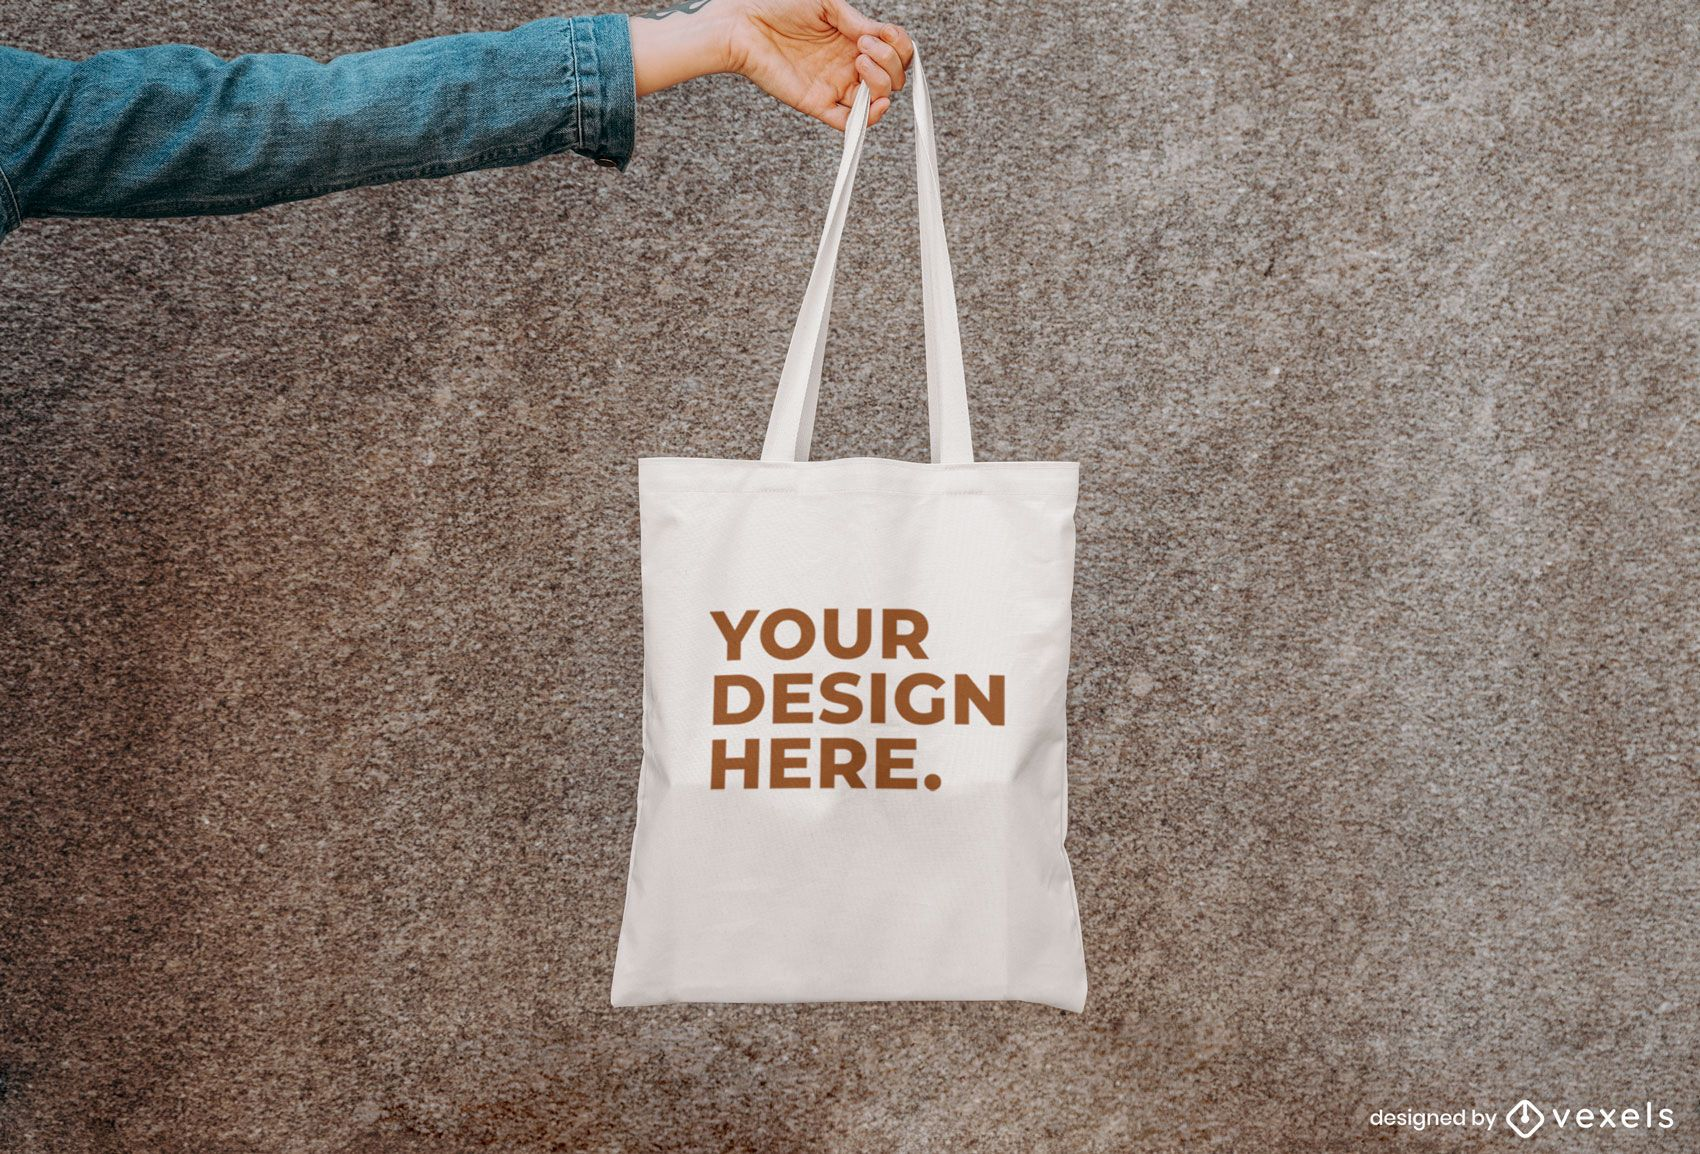 Design de maquete de sacola de parede